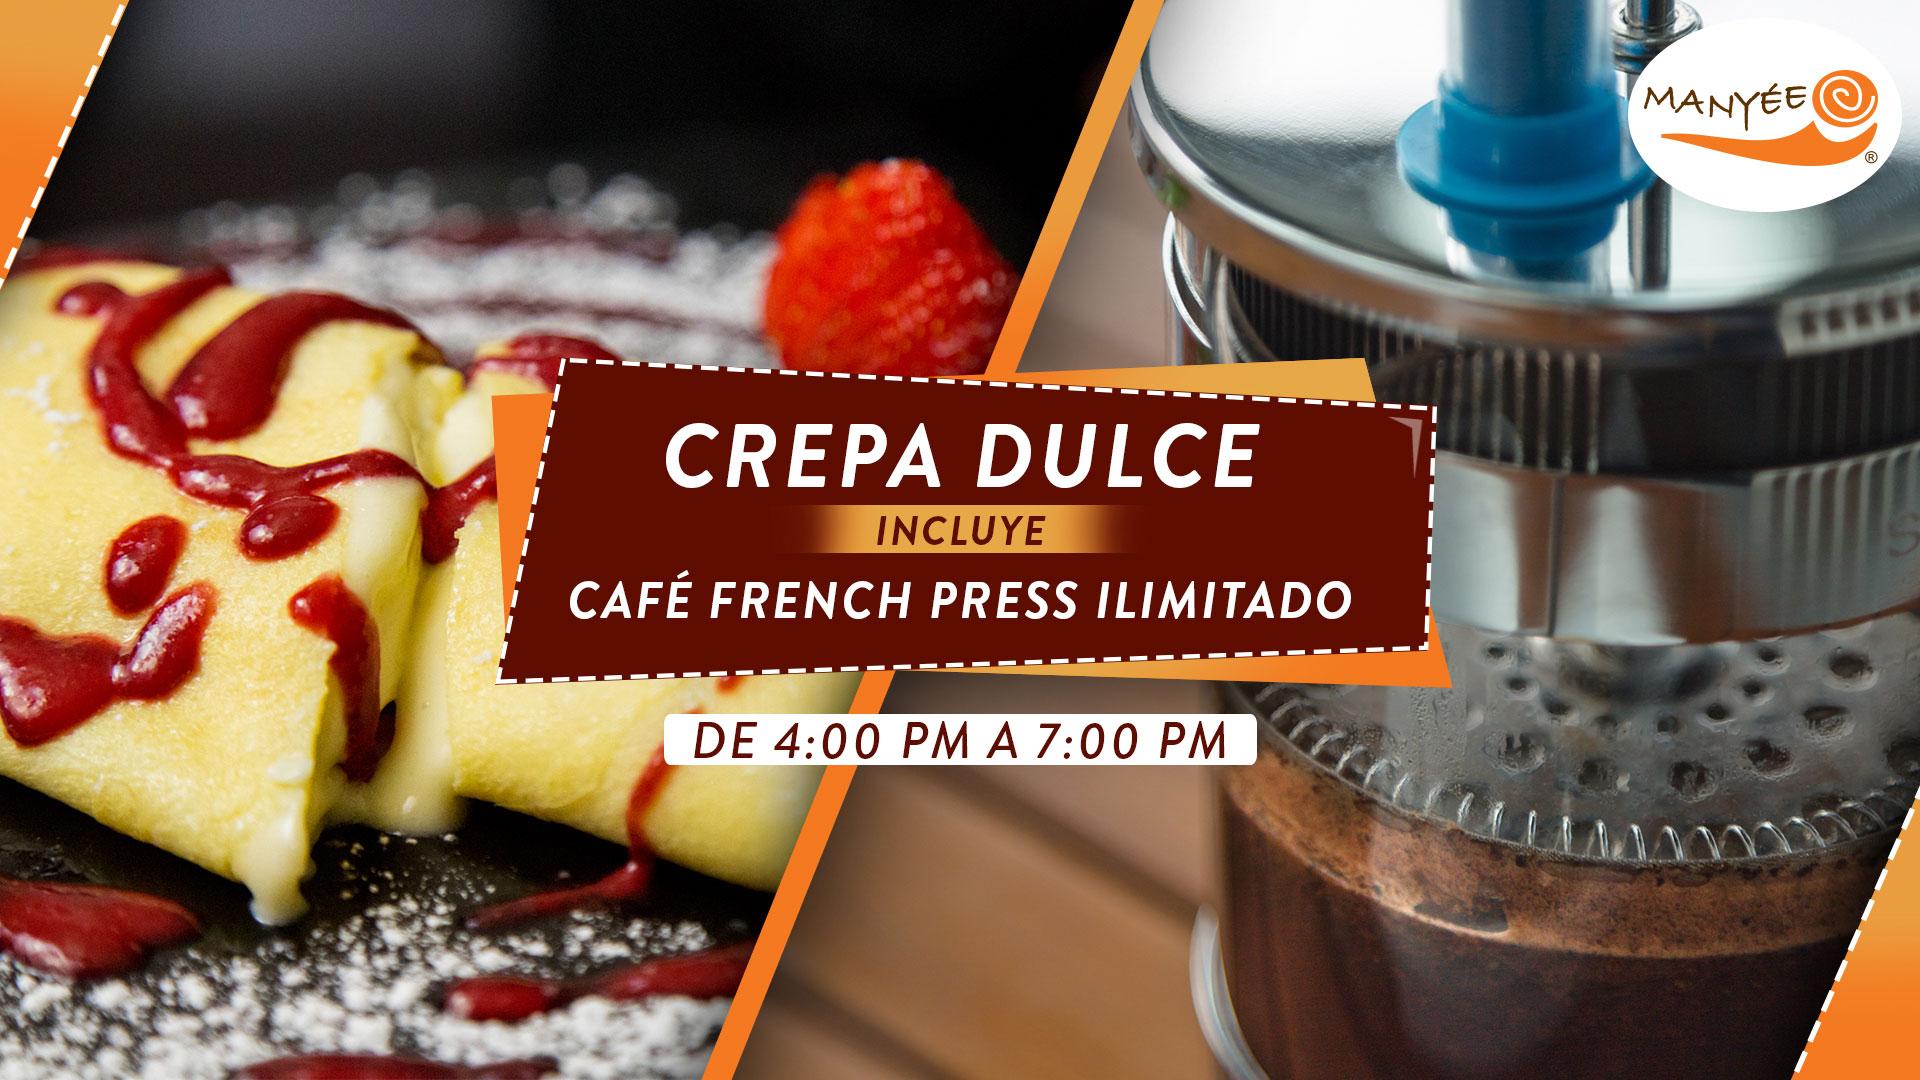 Manyee-Crepa-dulce